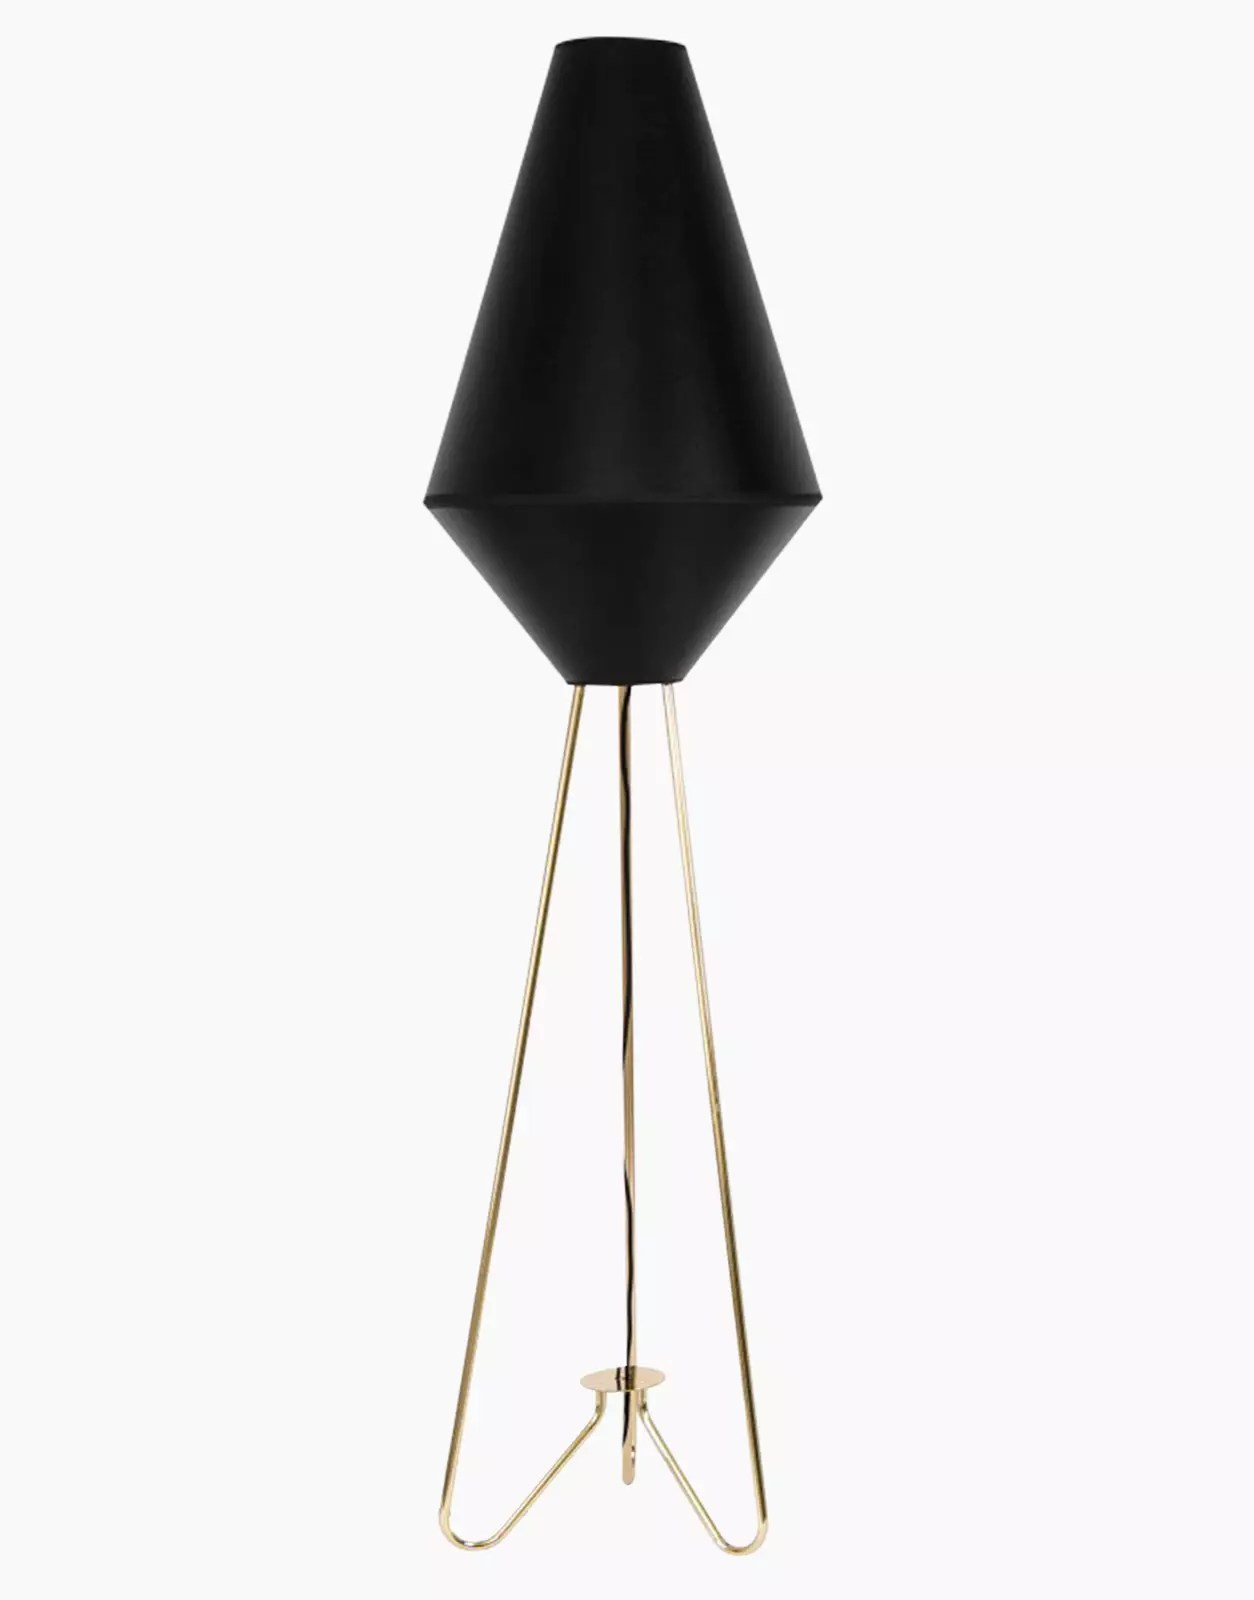 Atelier Du Luminaire Toulouse floor lamp lmp neuville - solution-design.fr - furniture - lighting -  decoration